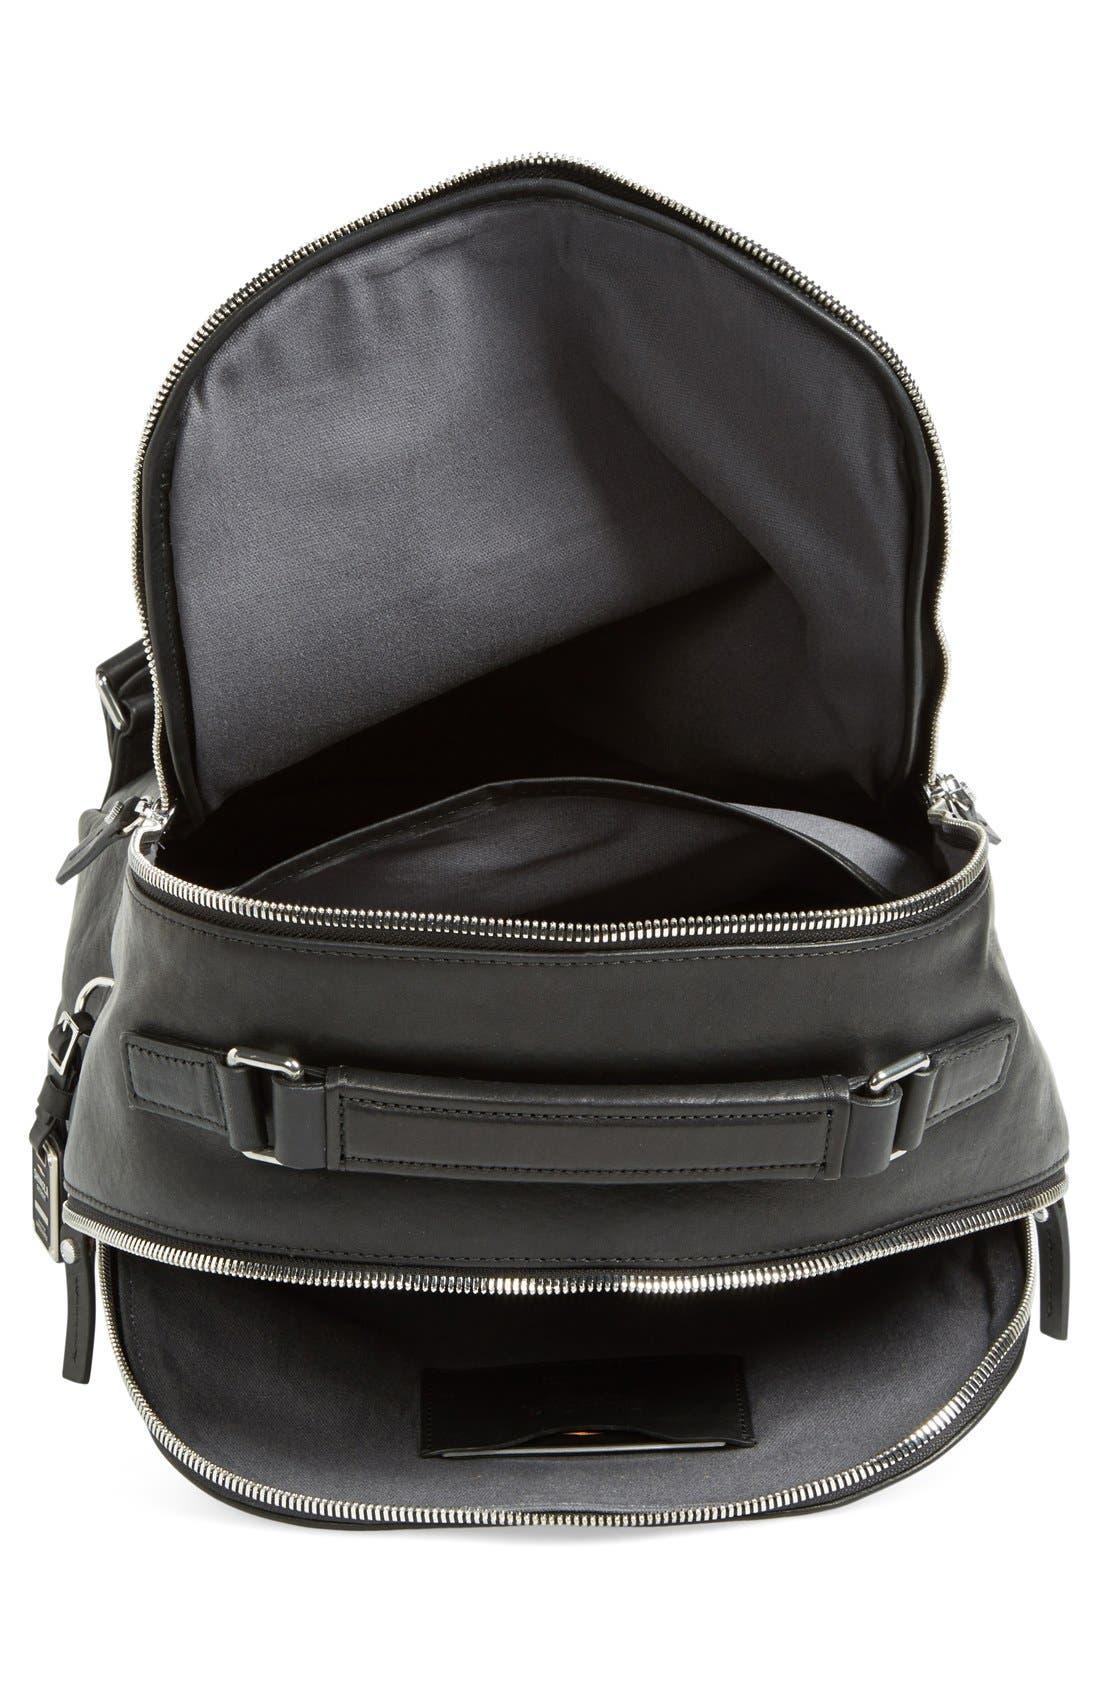 Runwell Leather Laptop Backpack,                             Alternate thumbnail 4, color,                             Black